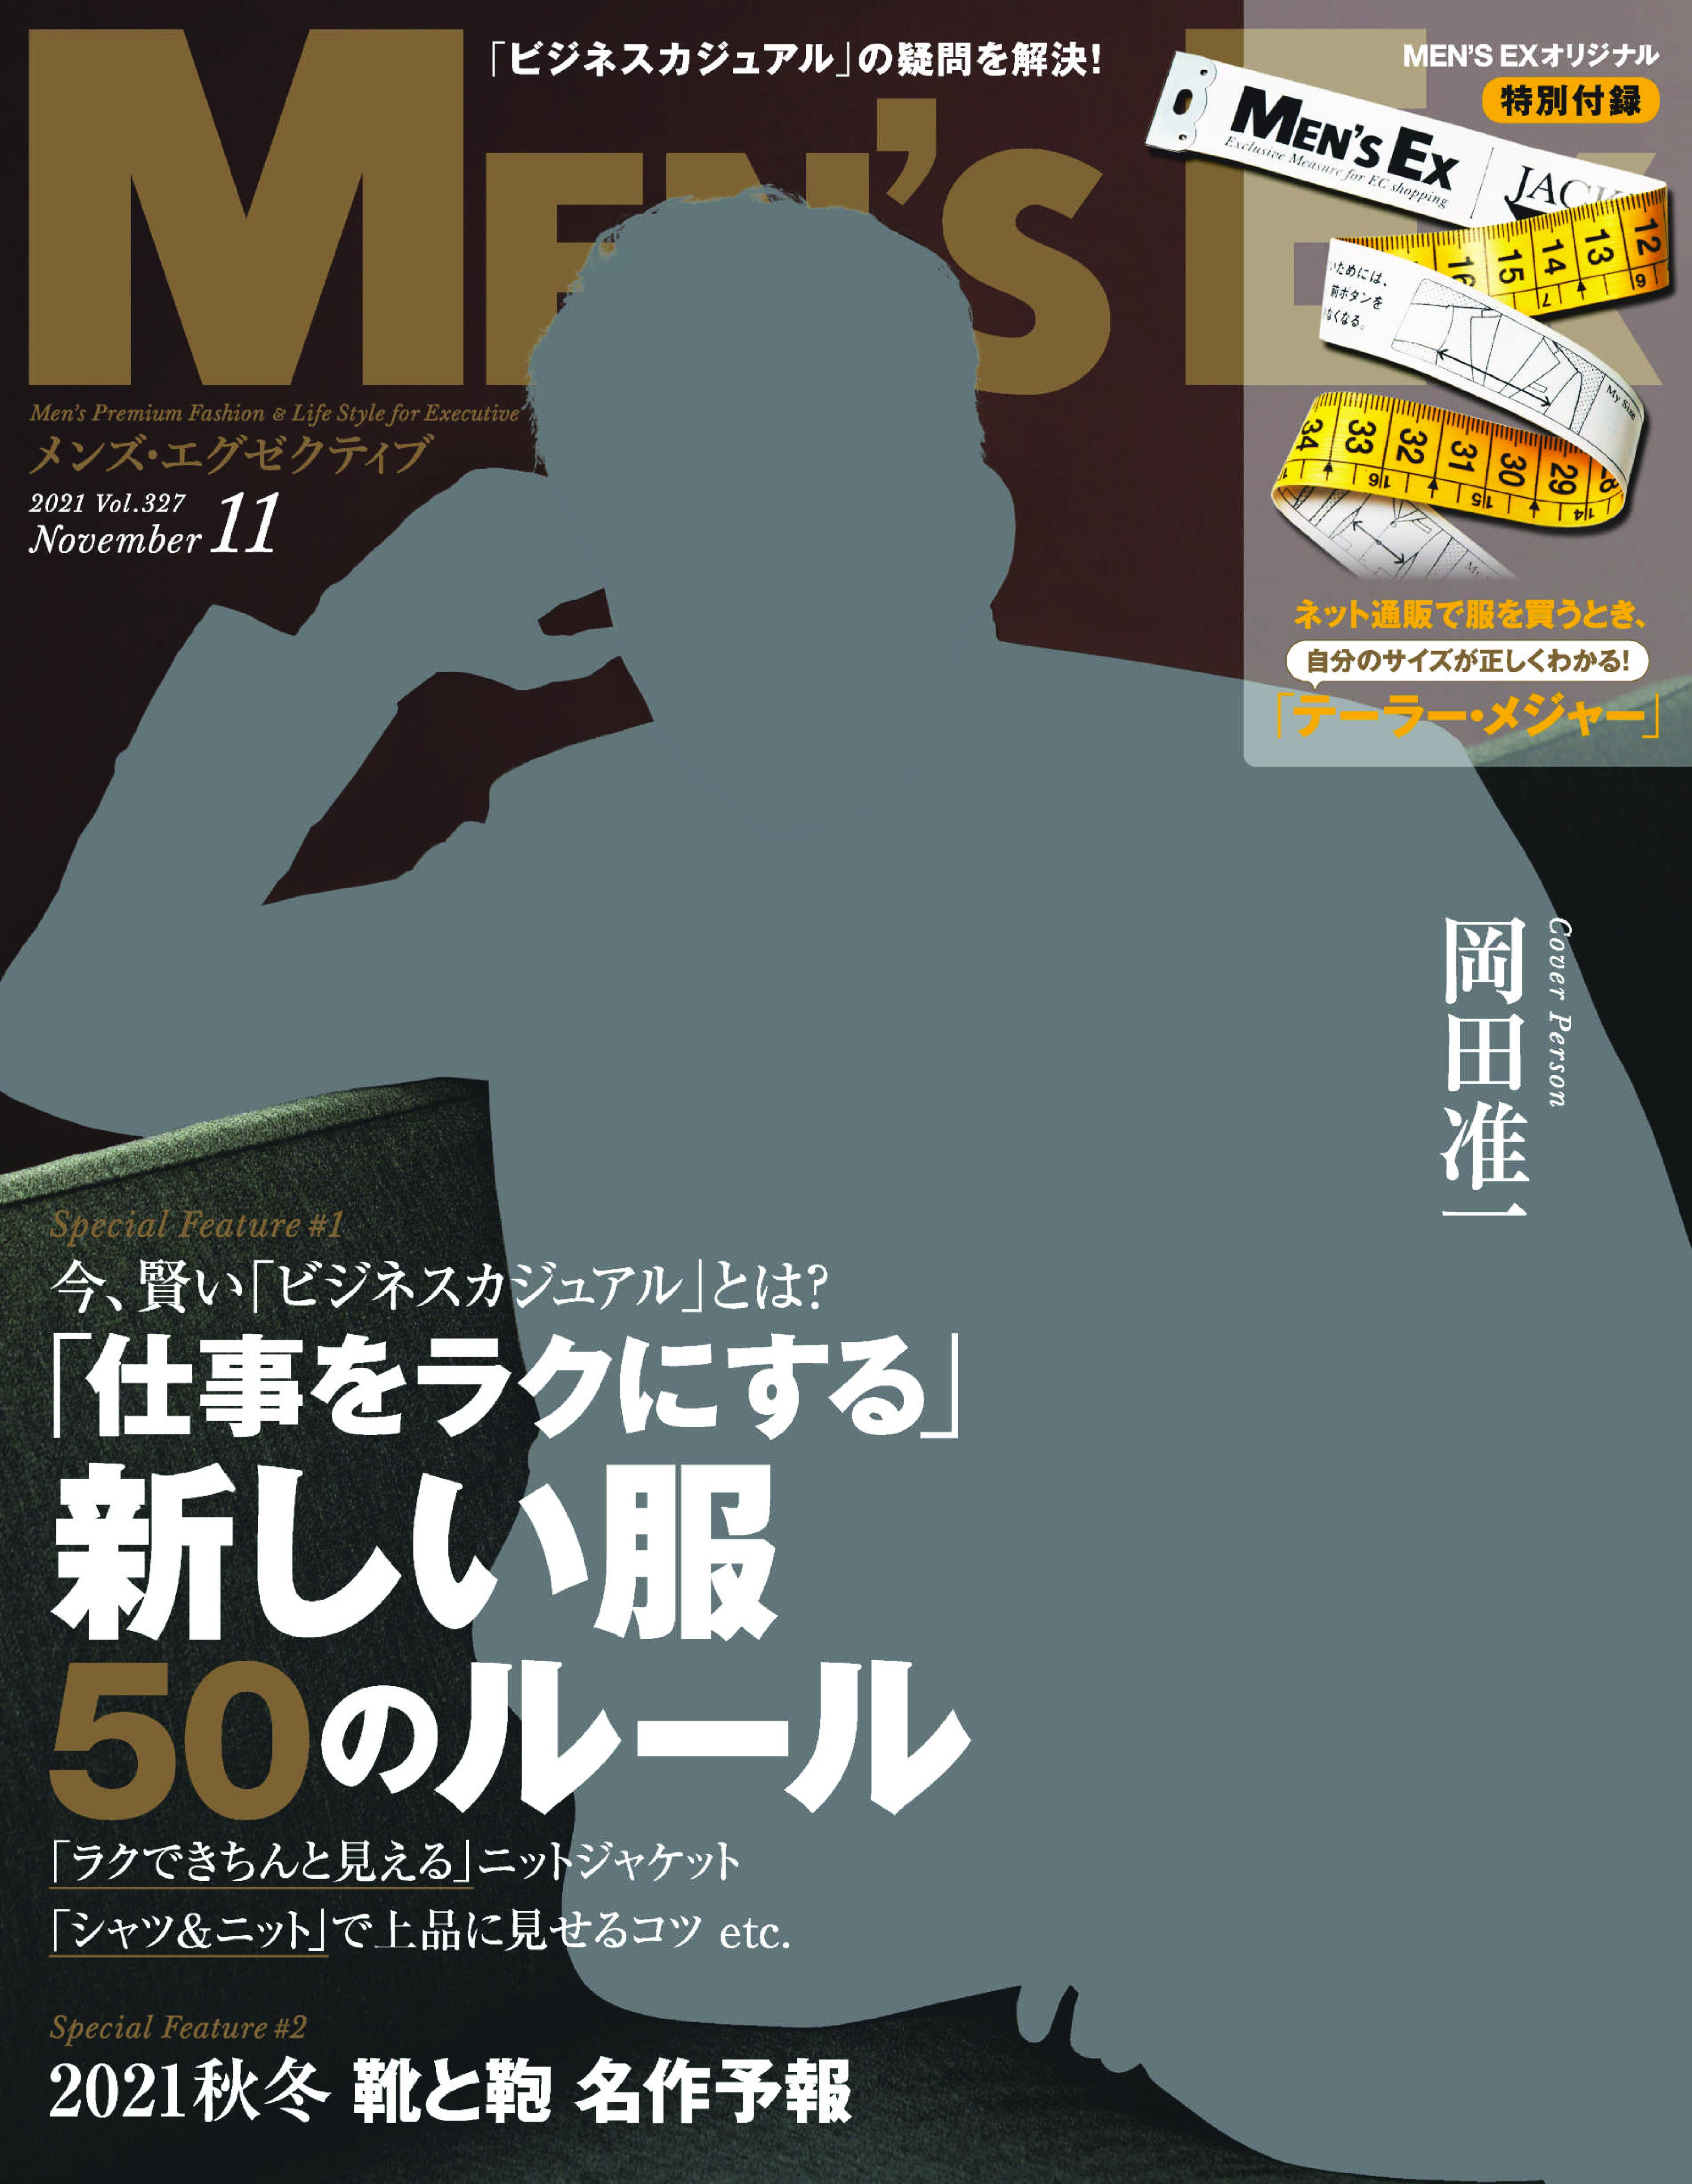 Men's EX メンズ・イーエックス - 10月 2021